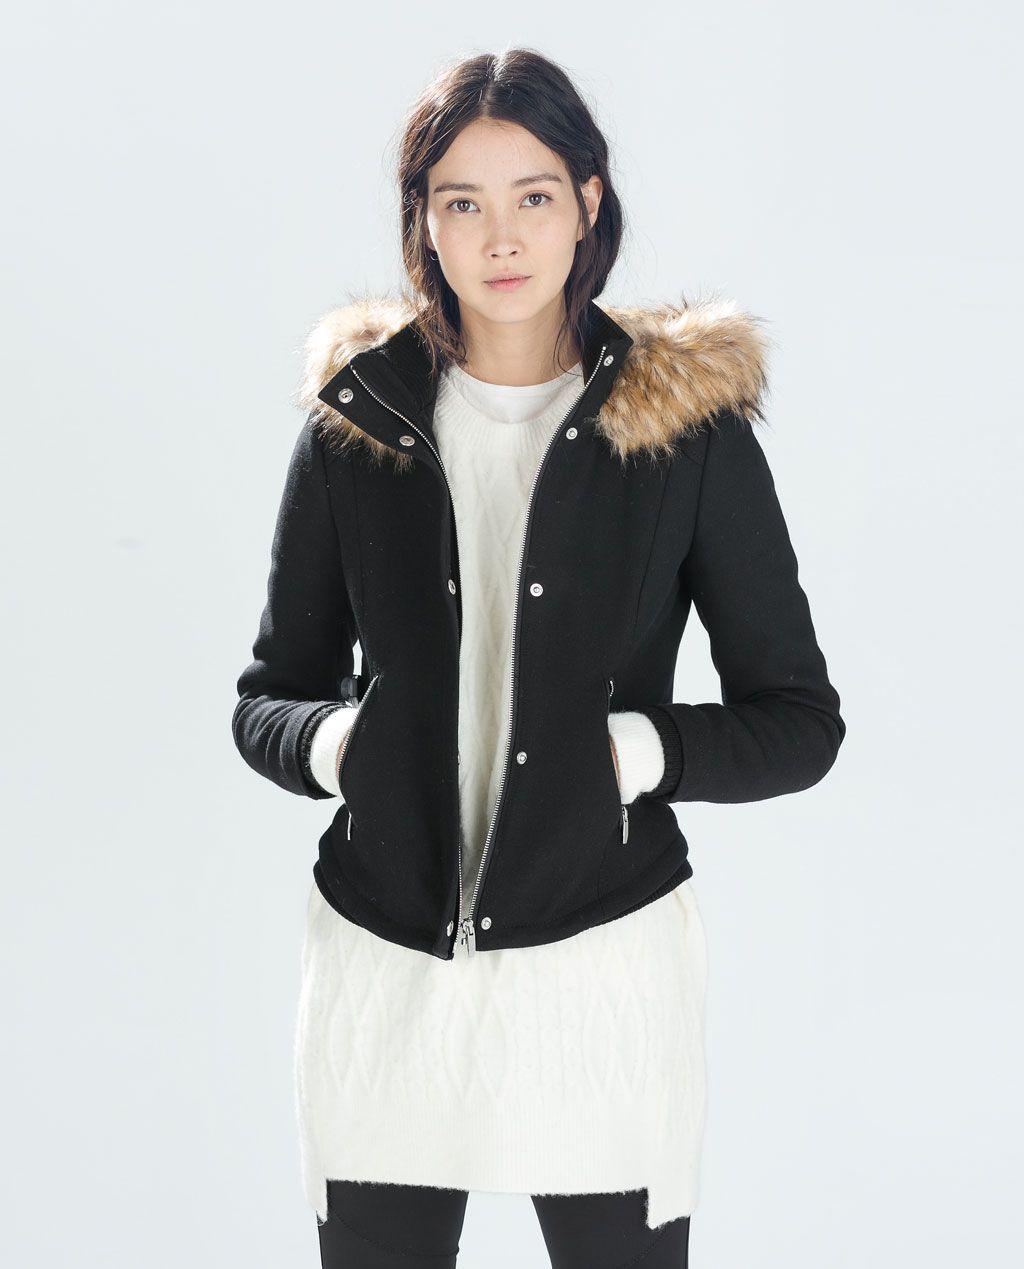 Jacket With Fur Hood Trf New This Week Zara United States Short Black Jacket Fur Hood Jacket Jackets [ 1269 x 1024 Pixel ]